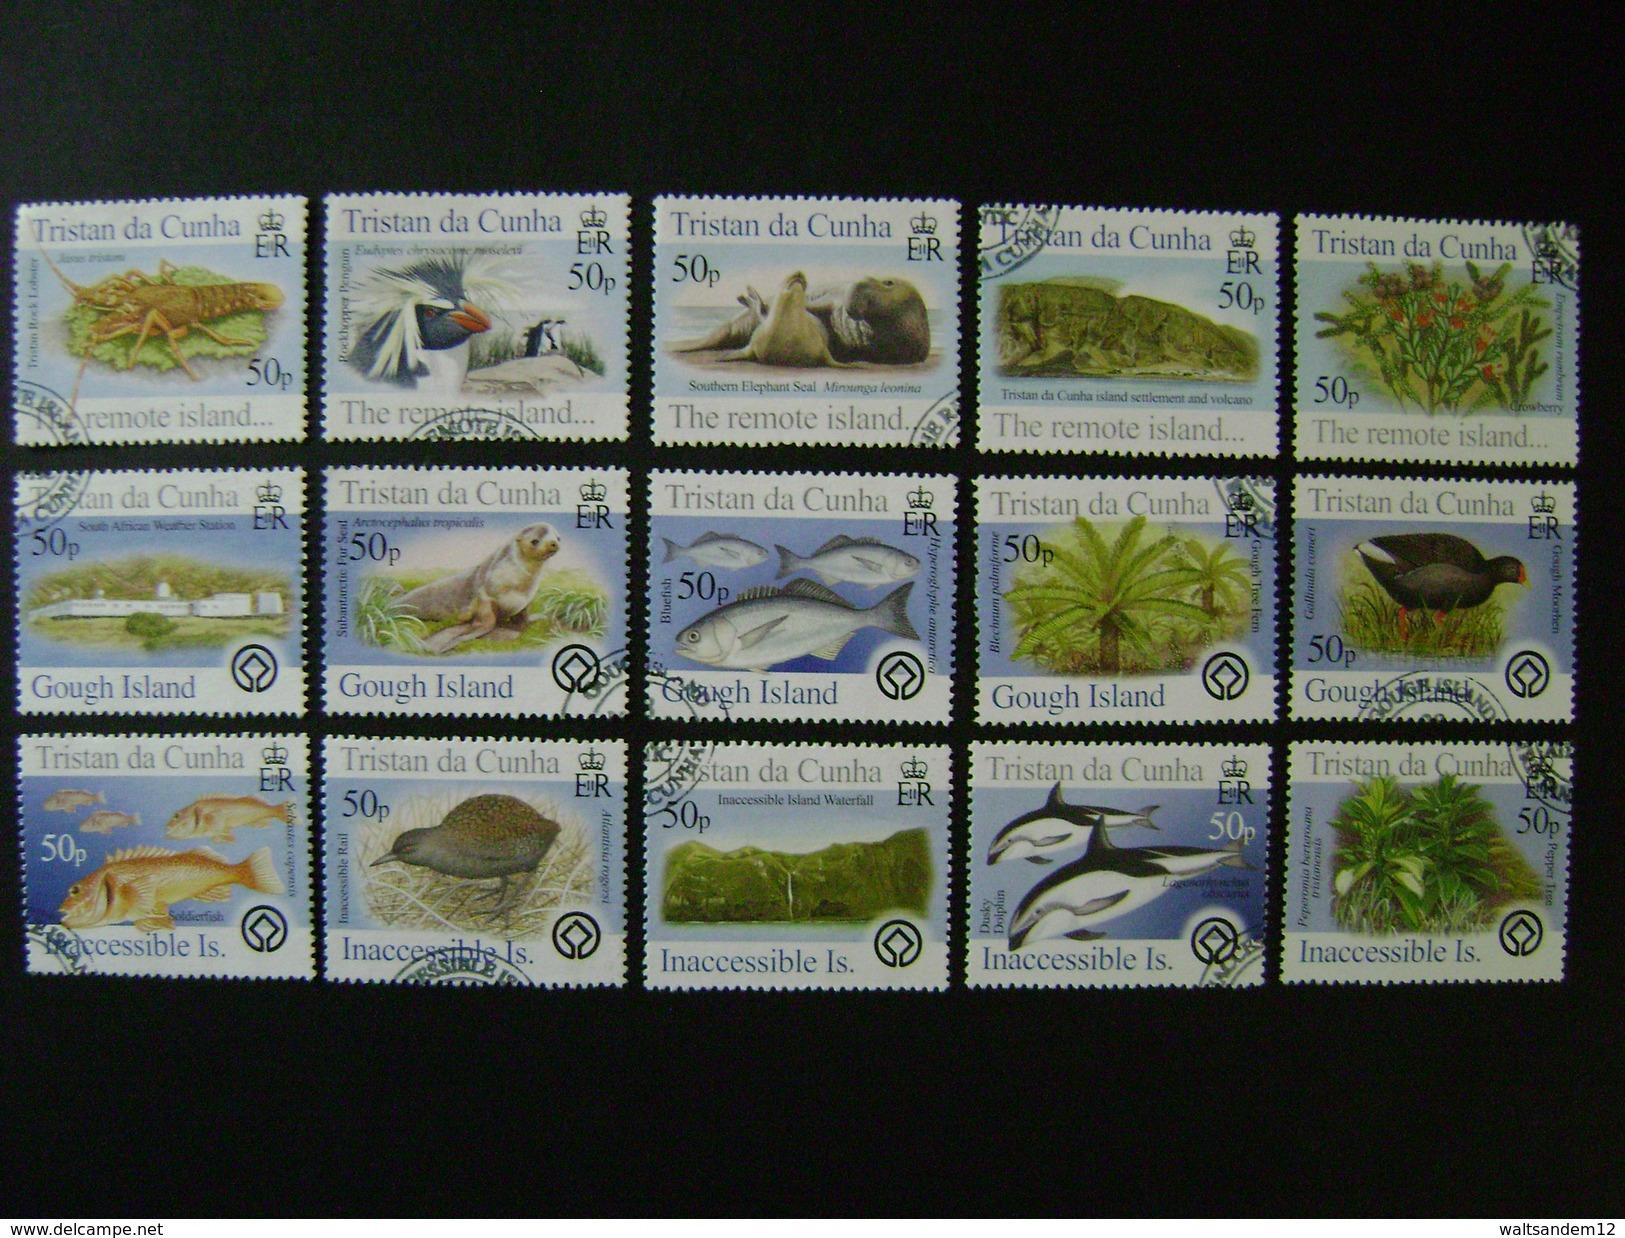 Tristan Da Cunha 2005 Commemorative Issues - Used - Tristan Da Cunha